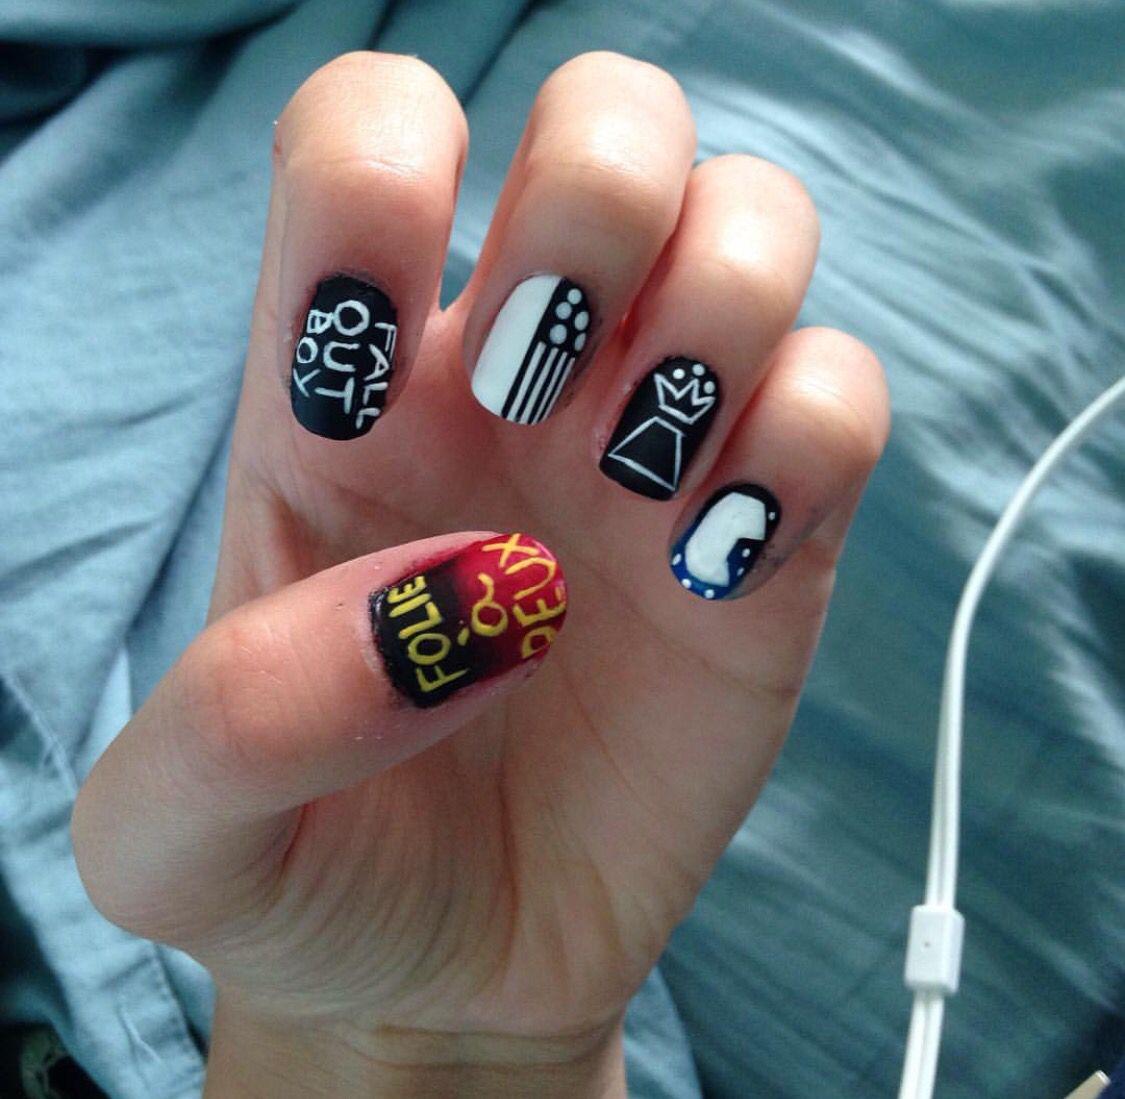 Fall Out Boy | Nails | Pinterest | Emo nail art, Teen hair and Face ...